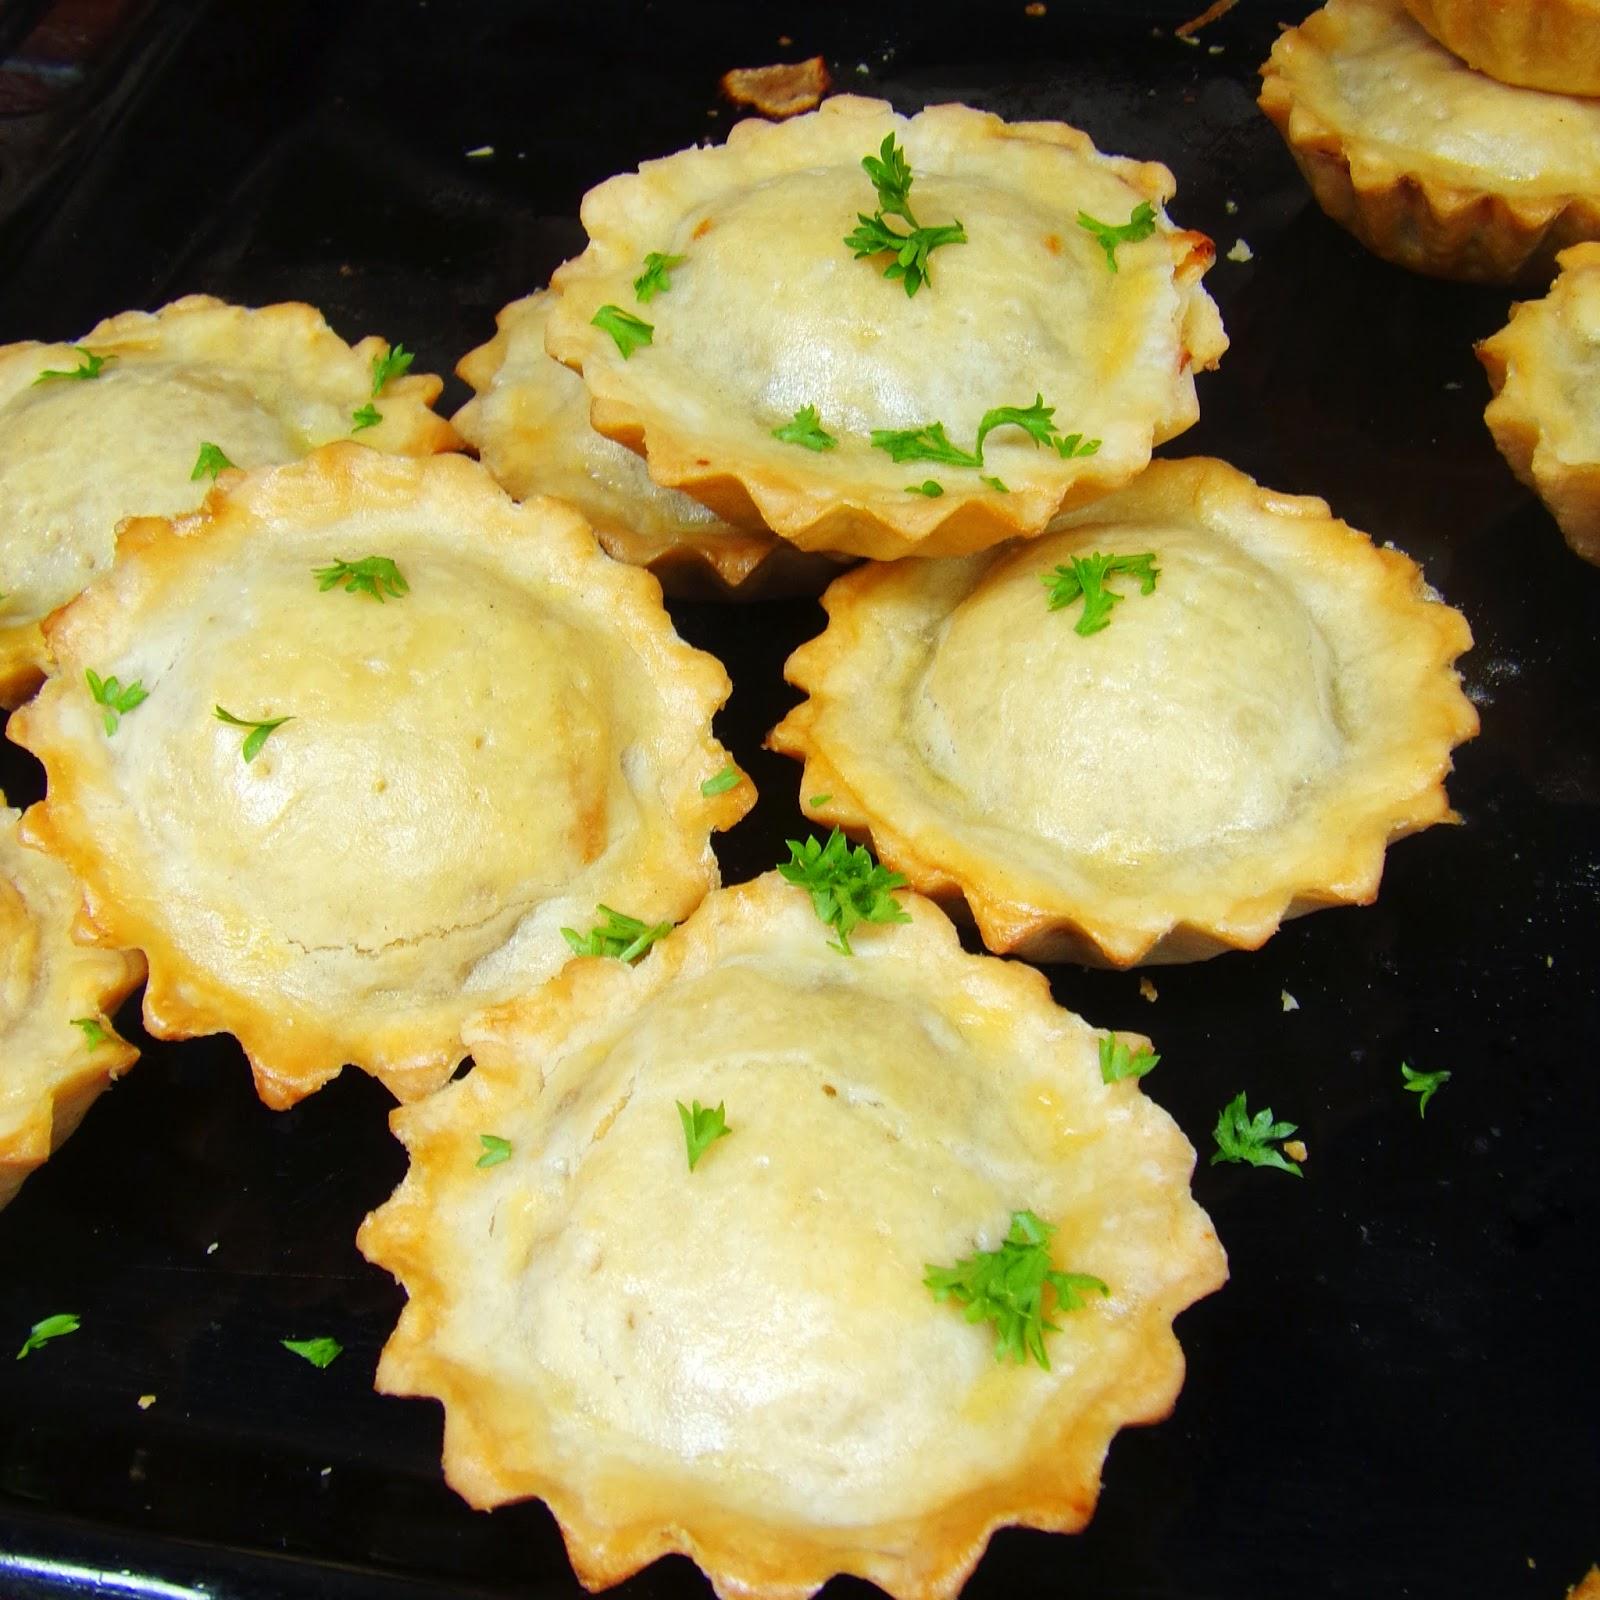 meat recipe, pie recipes, how to make pie crust, easy pie recipes